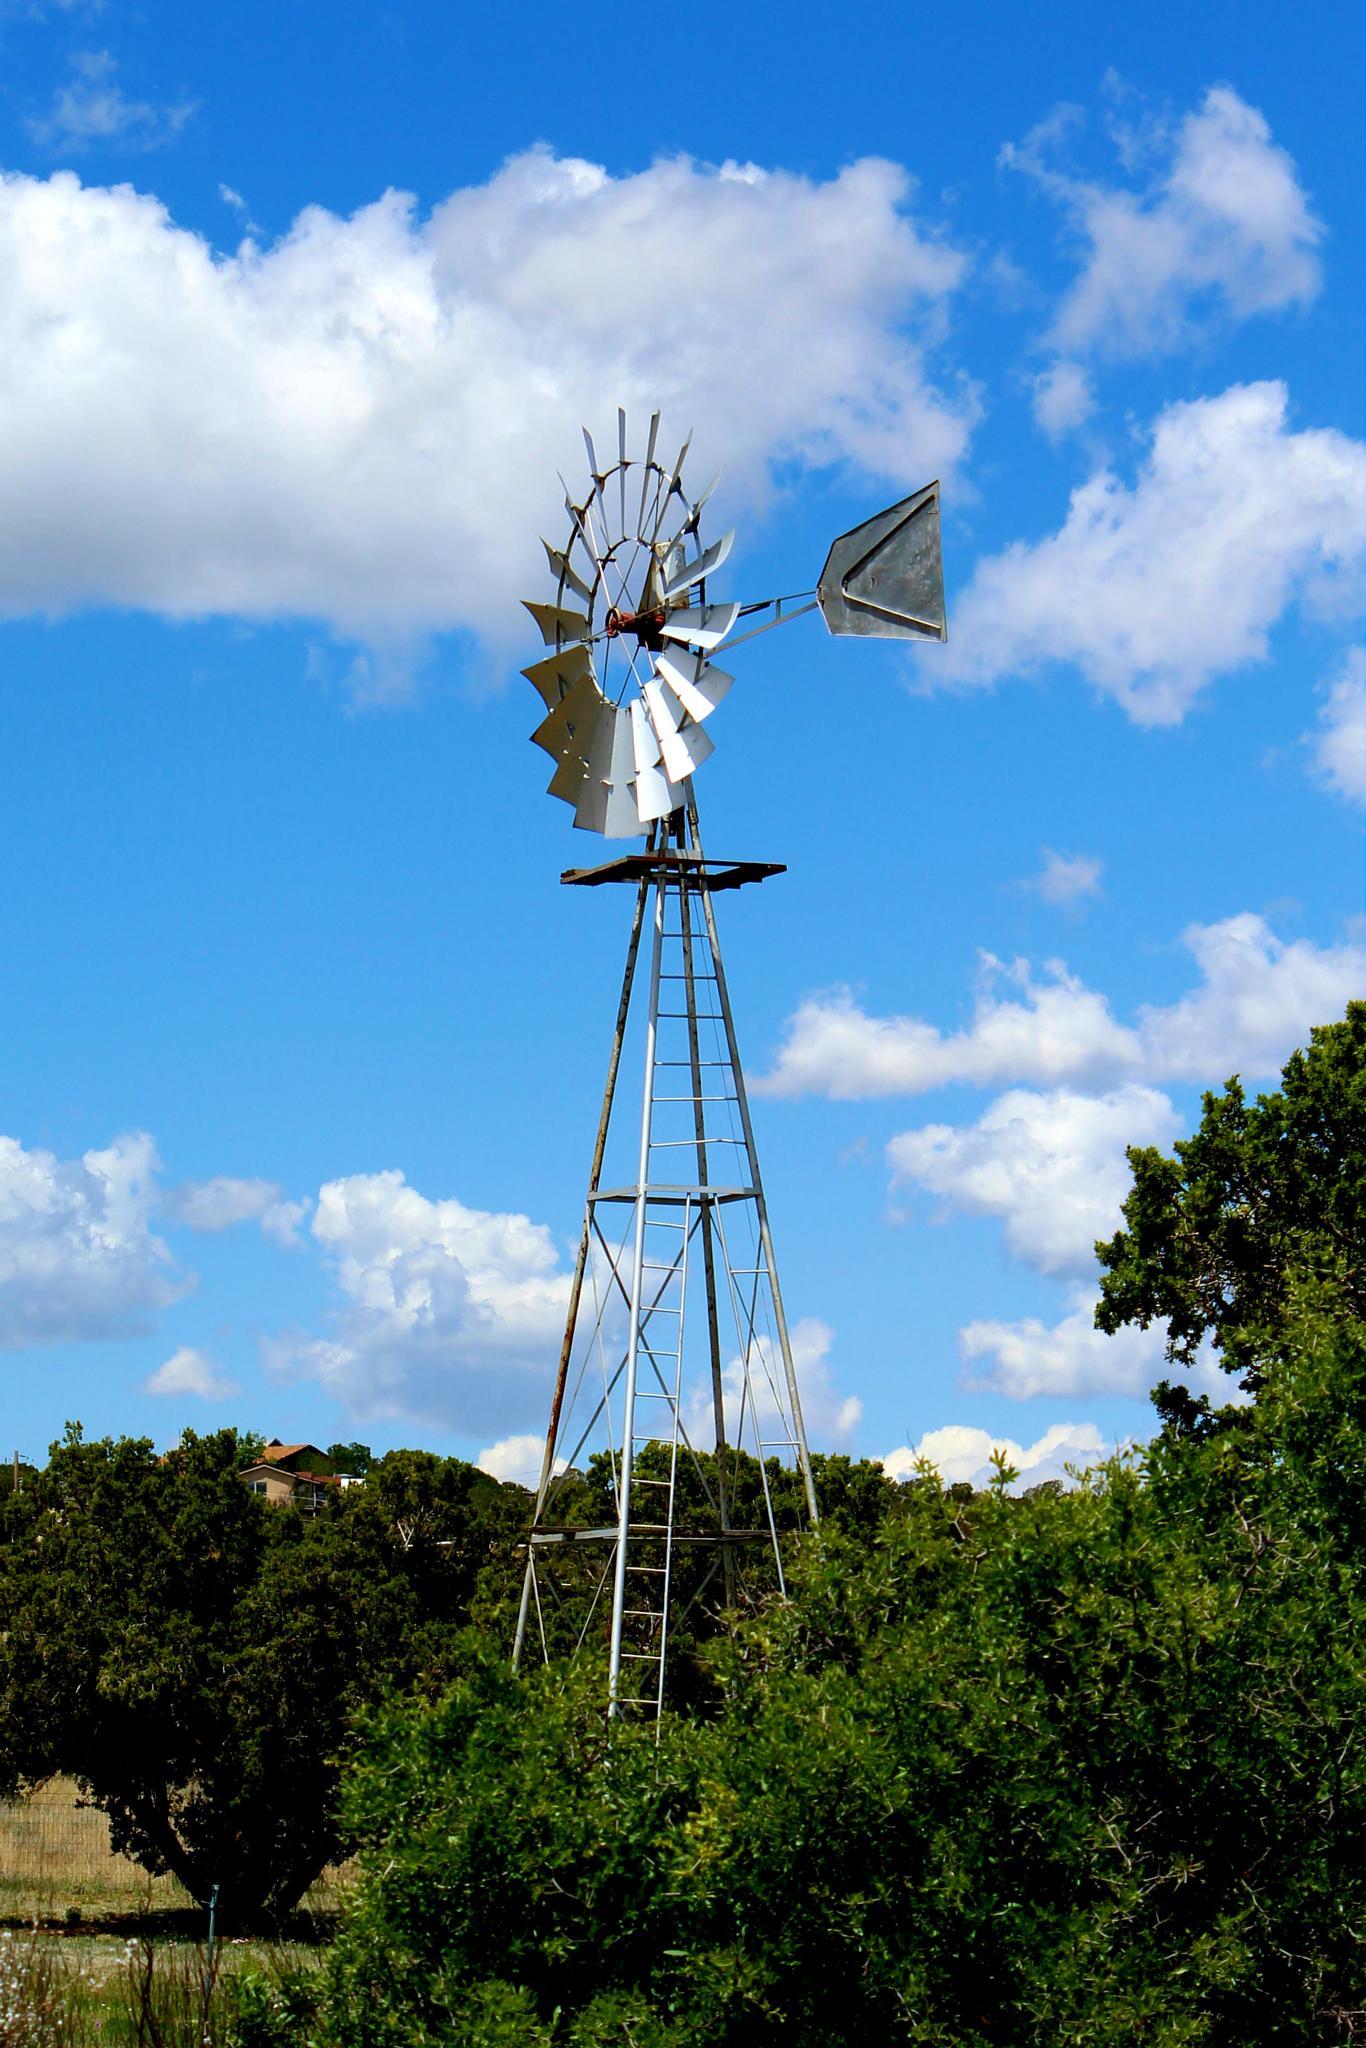 Windmill by Lucretia Bittner